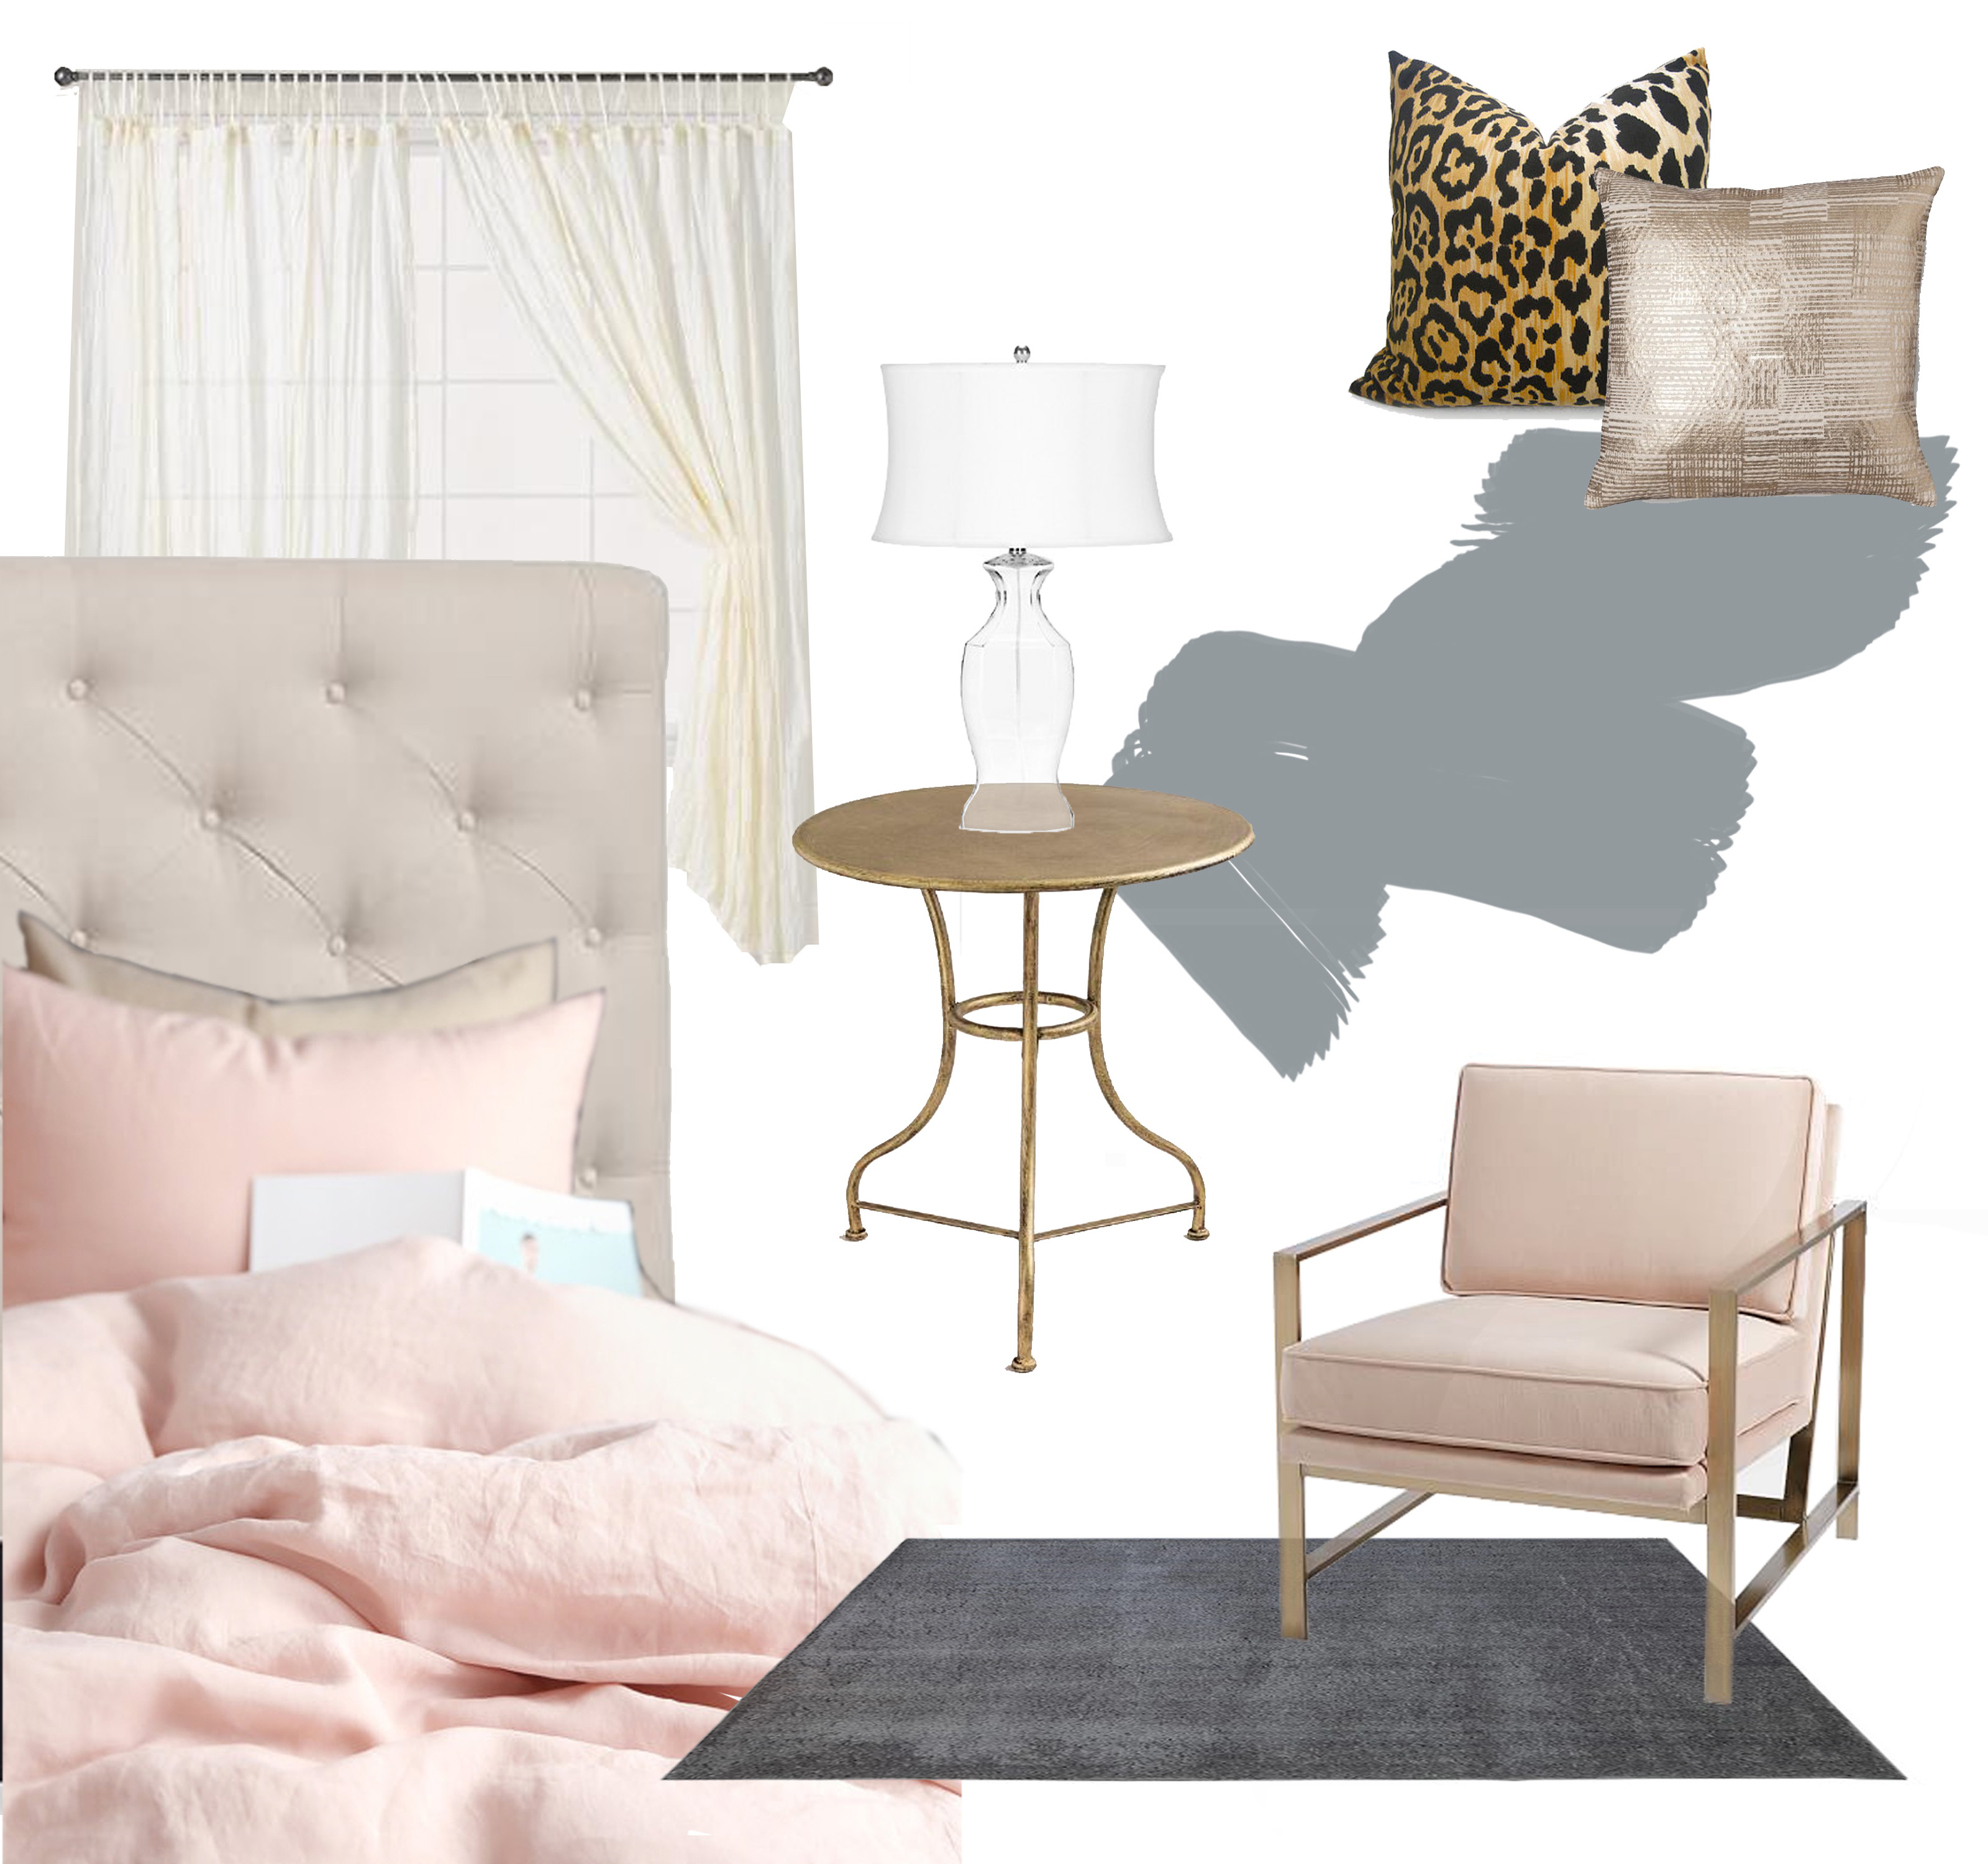 Blushing Blogger - Kassy On Design